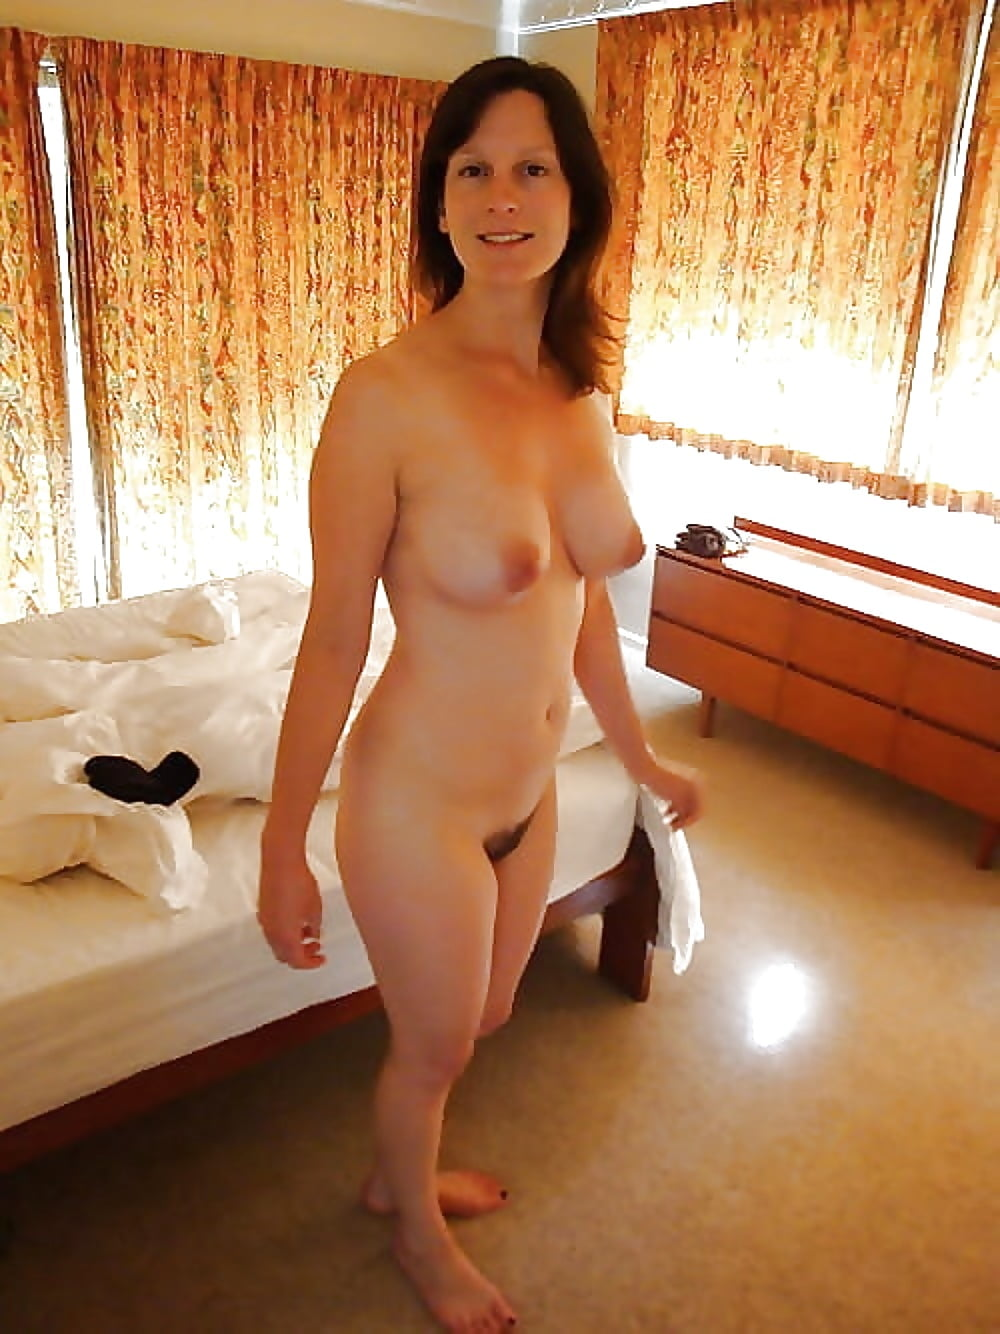 Boob pantyhose beautiful wives posing nude girls nude videos